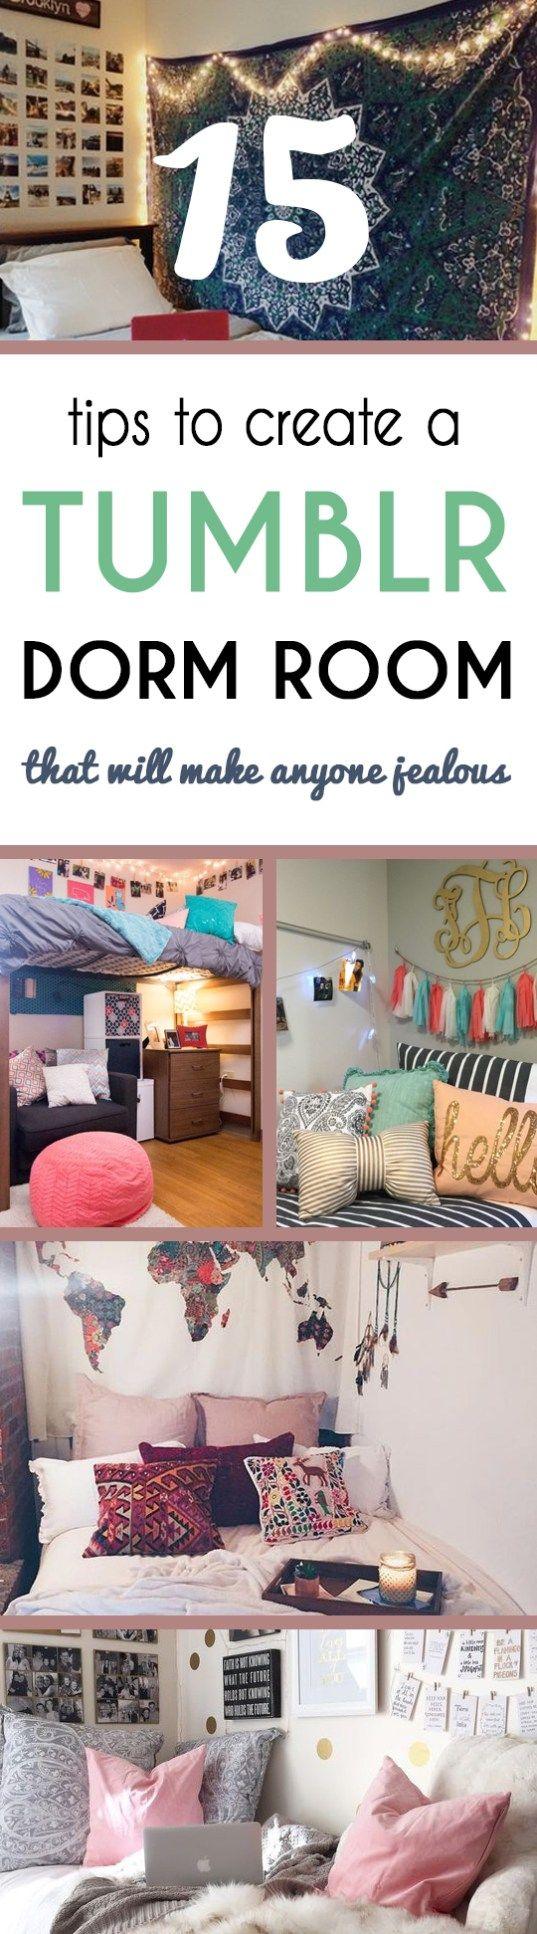 Tips To Create A Tumblr Dorm Room Thatll Make Anyone Jealous